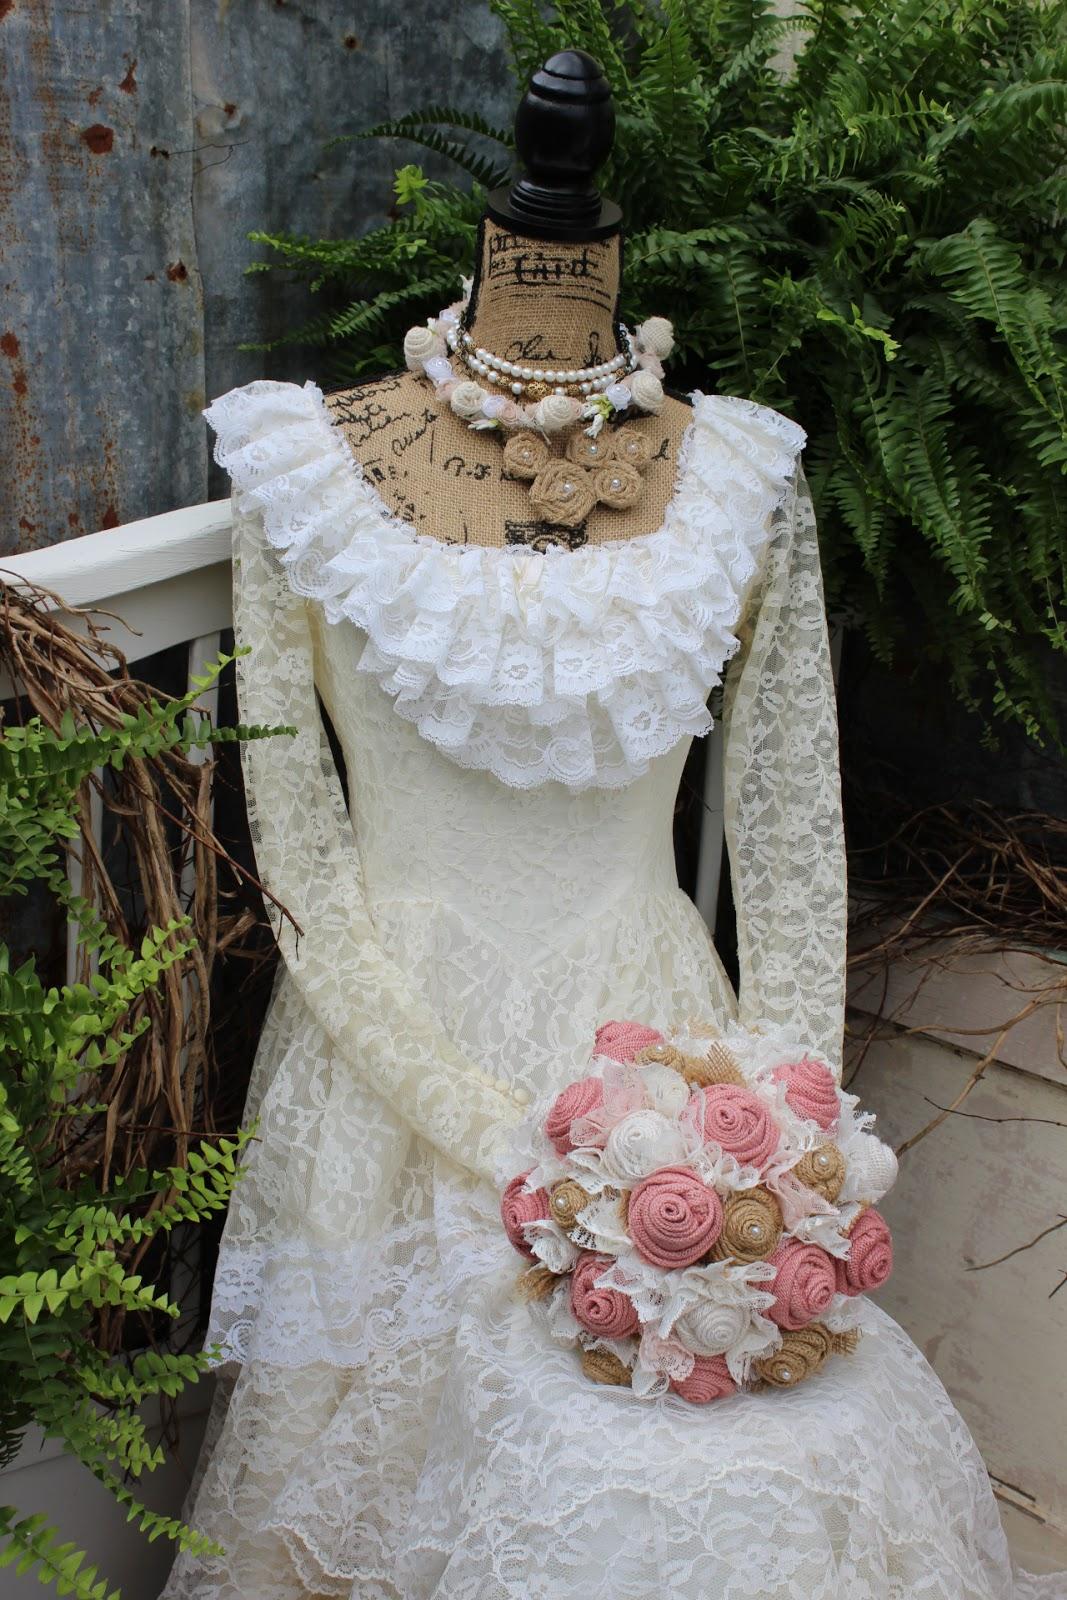 Gypsyfarmgirl blush pink burlap wedding bouquets and new items blush pink burlap wedding bouquets and new items ombrellifo Gallery